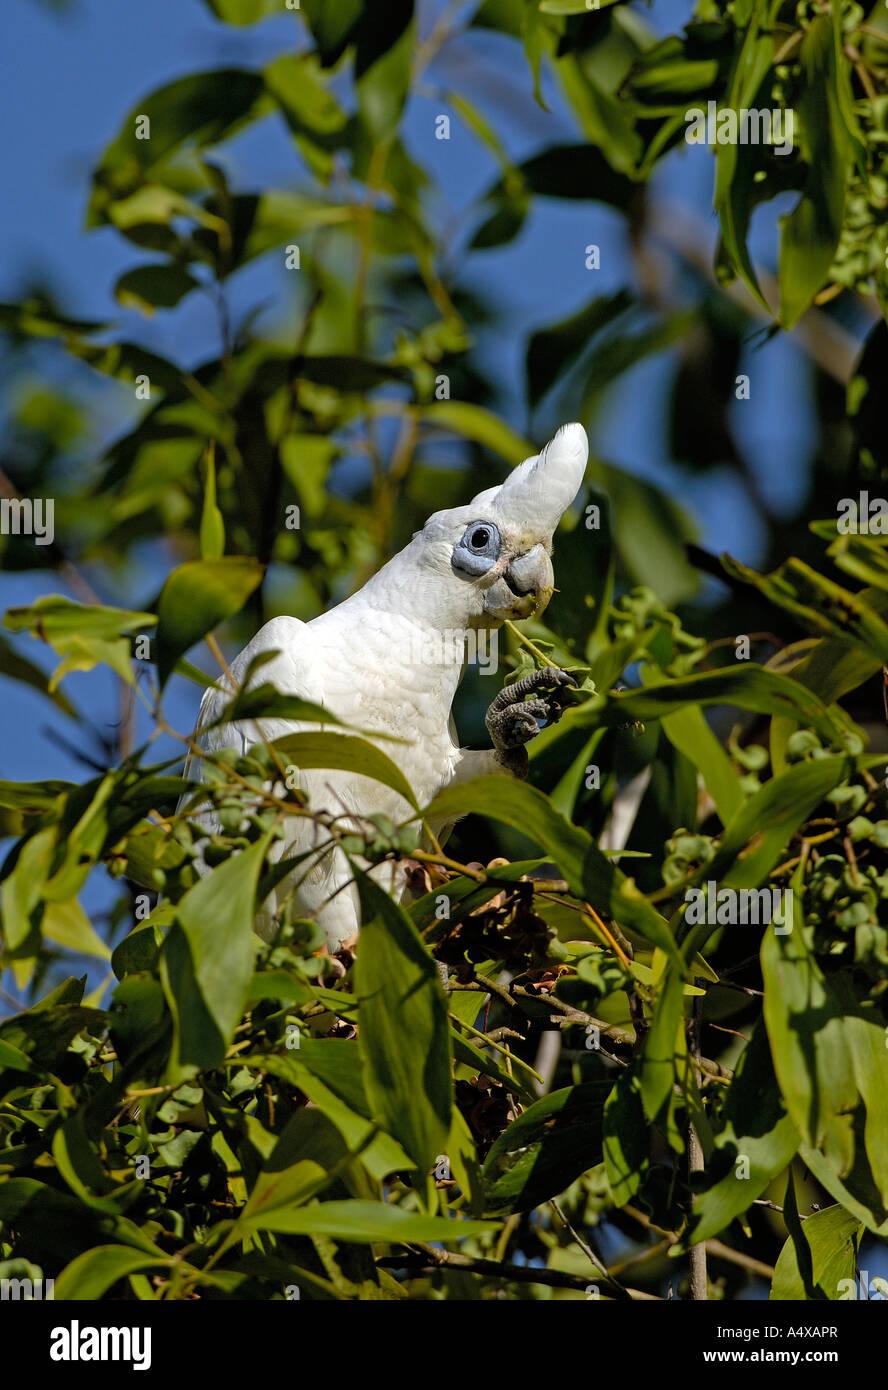 Little corella, Cacatua sanguinea, Northern territory australia - Stock Image